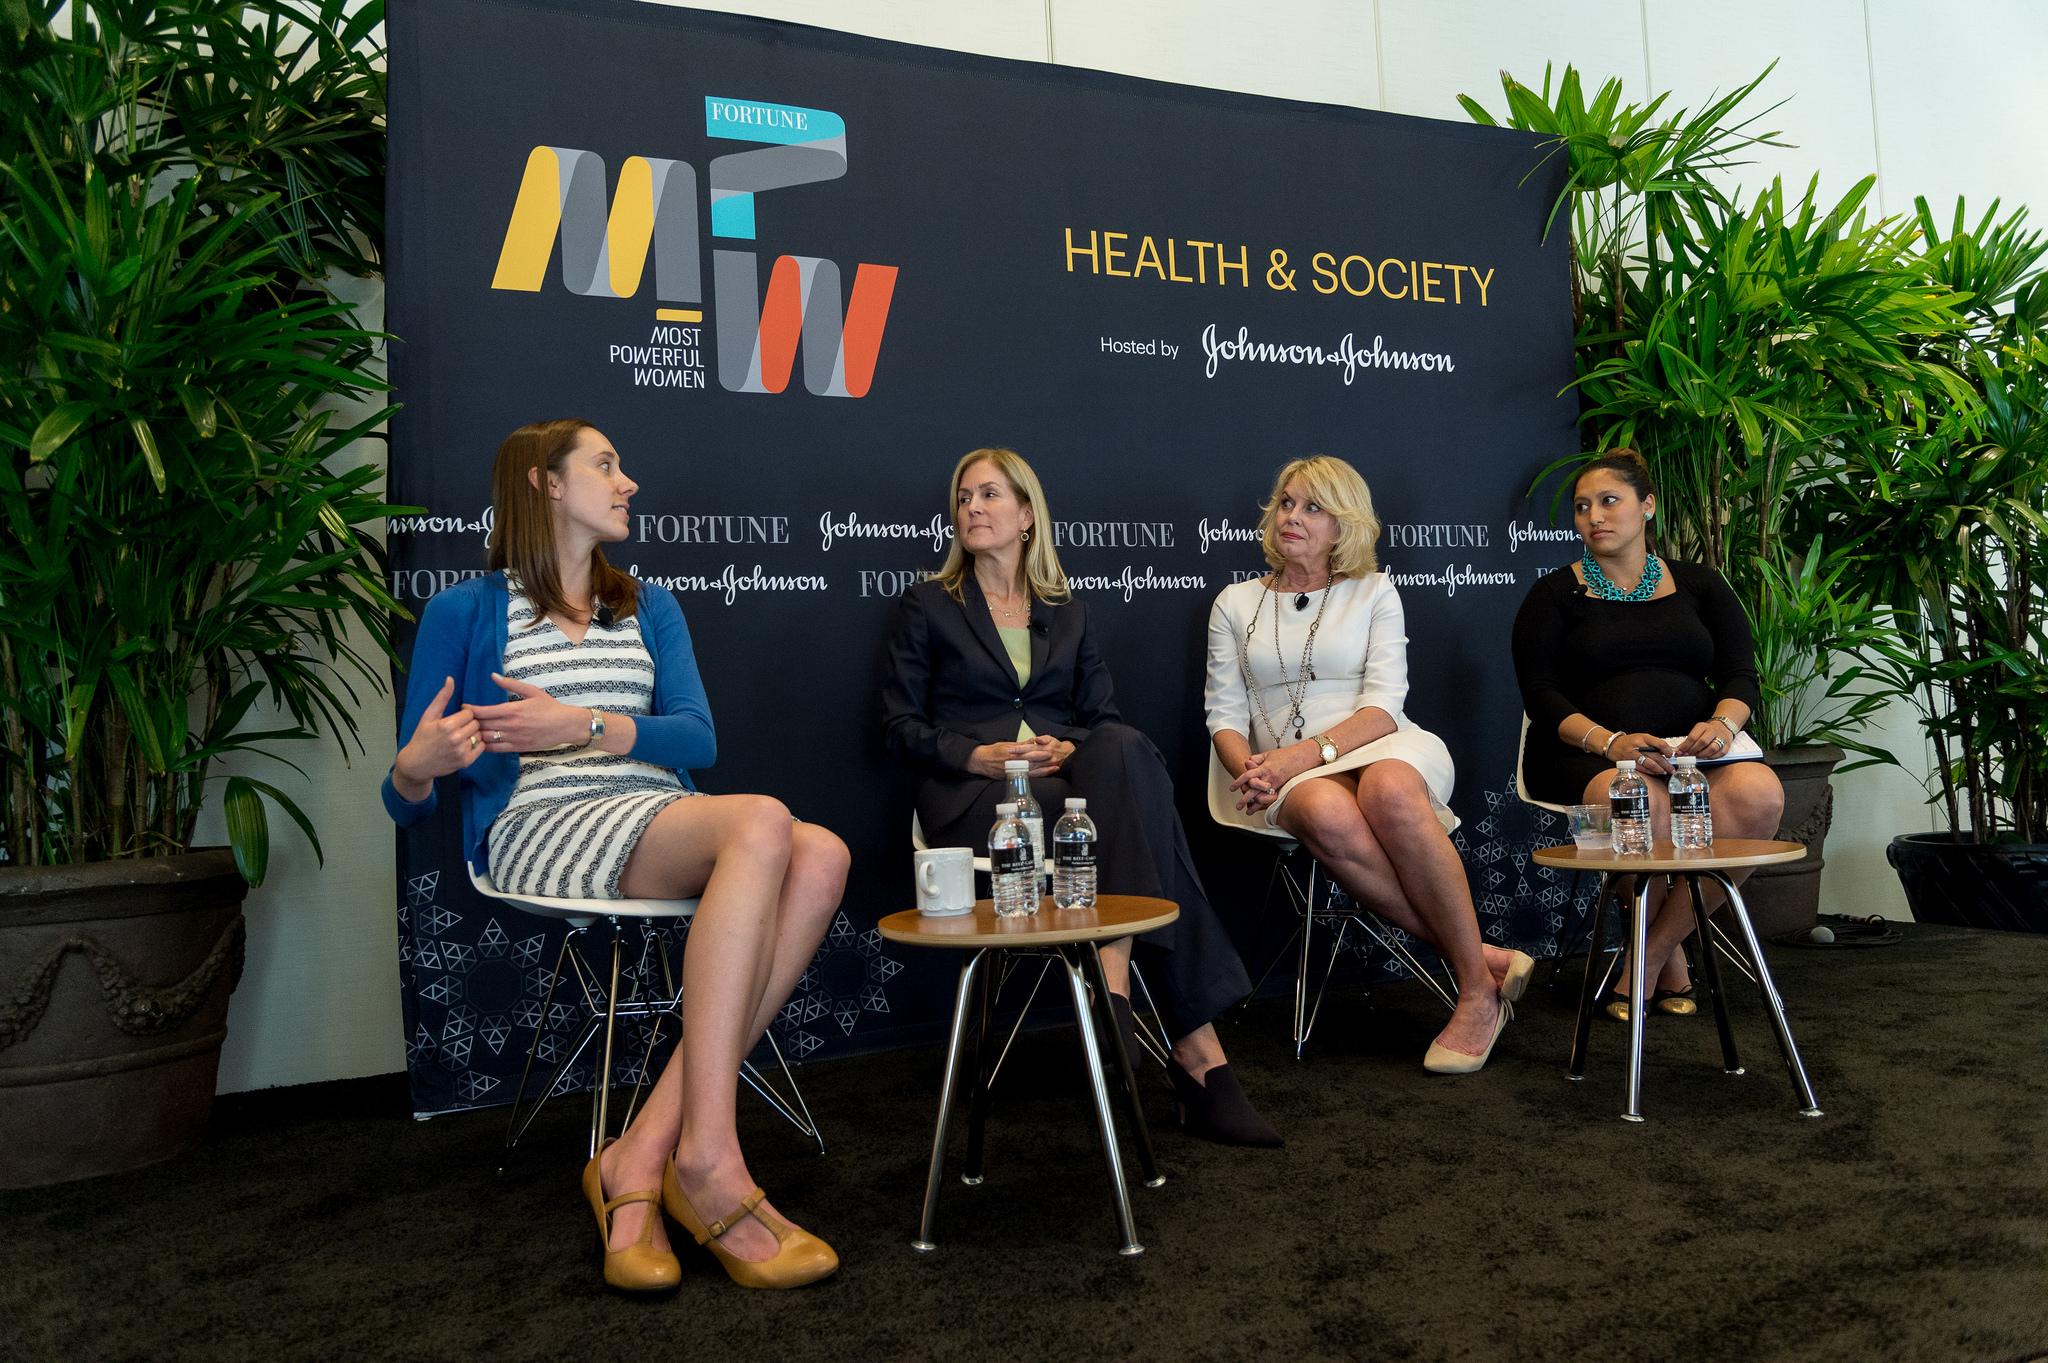 2016 Fortune Most Powerful Women Summit